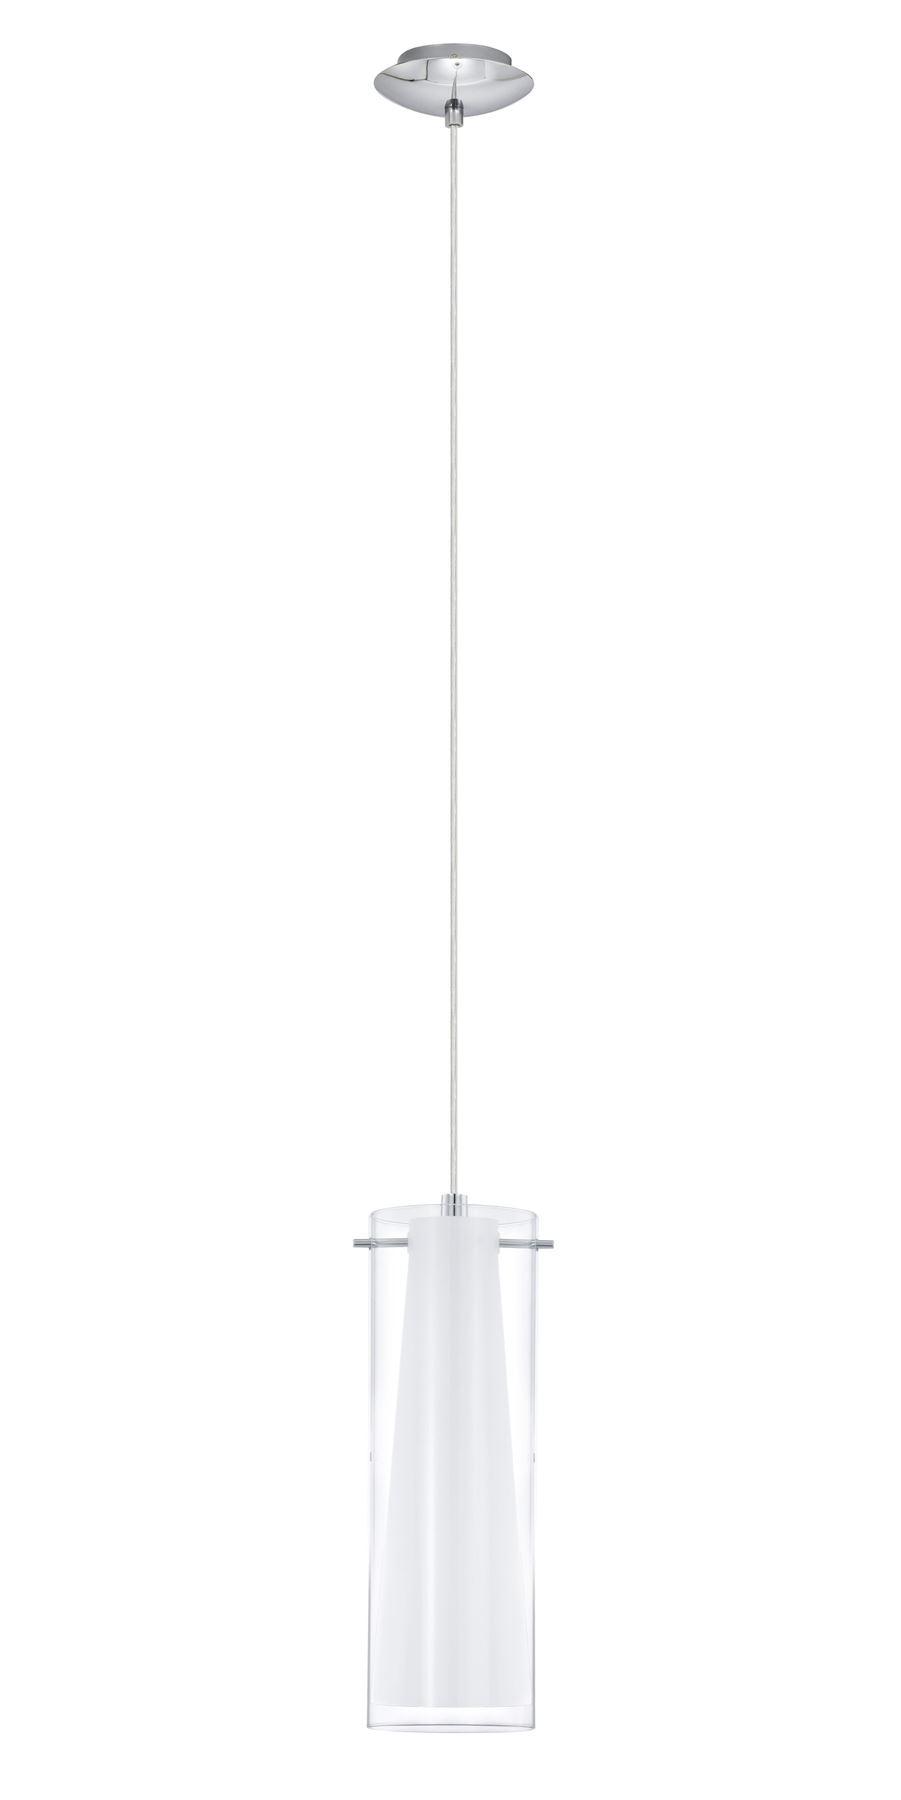 Pendant Lamp Pinto 1 Light E27 Height 1100 mm Chrome And Glass